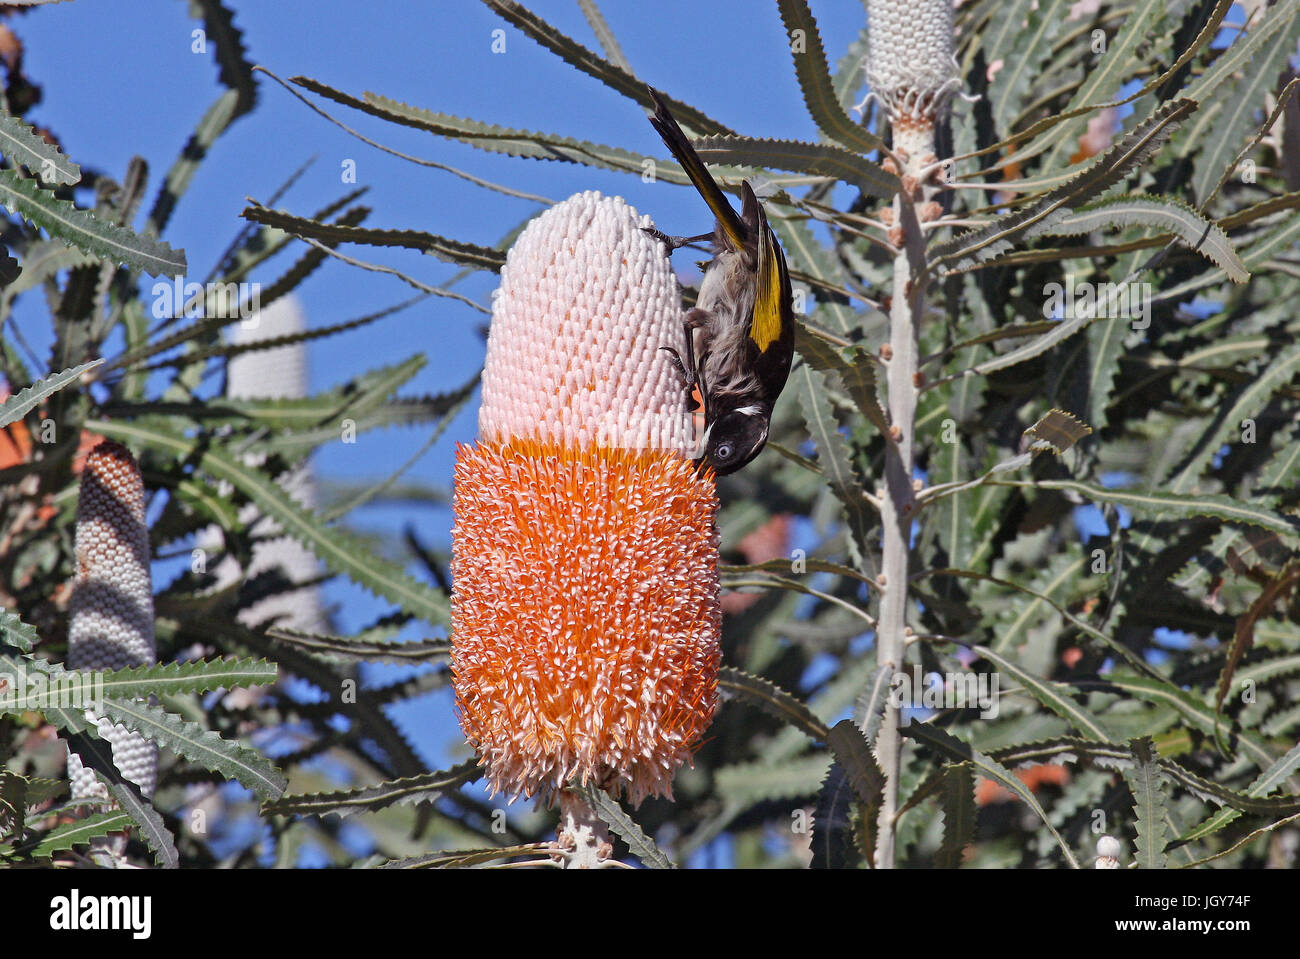 A New Holland Honeyeater (Phylidonyris novaehollandiae longirostris) feeding from a Banksia flower near Dwellingup - Stock Image